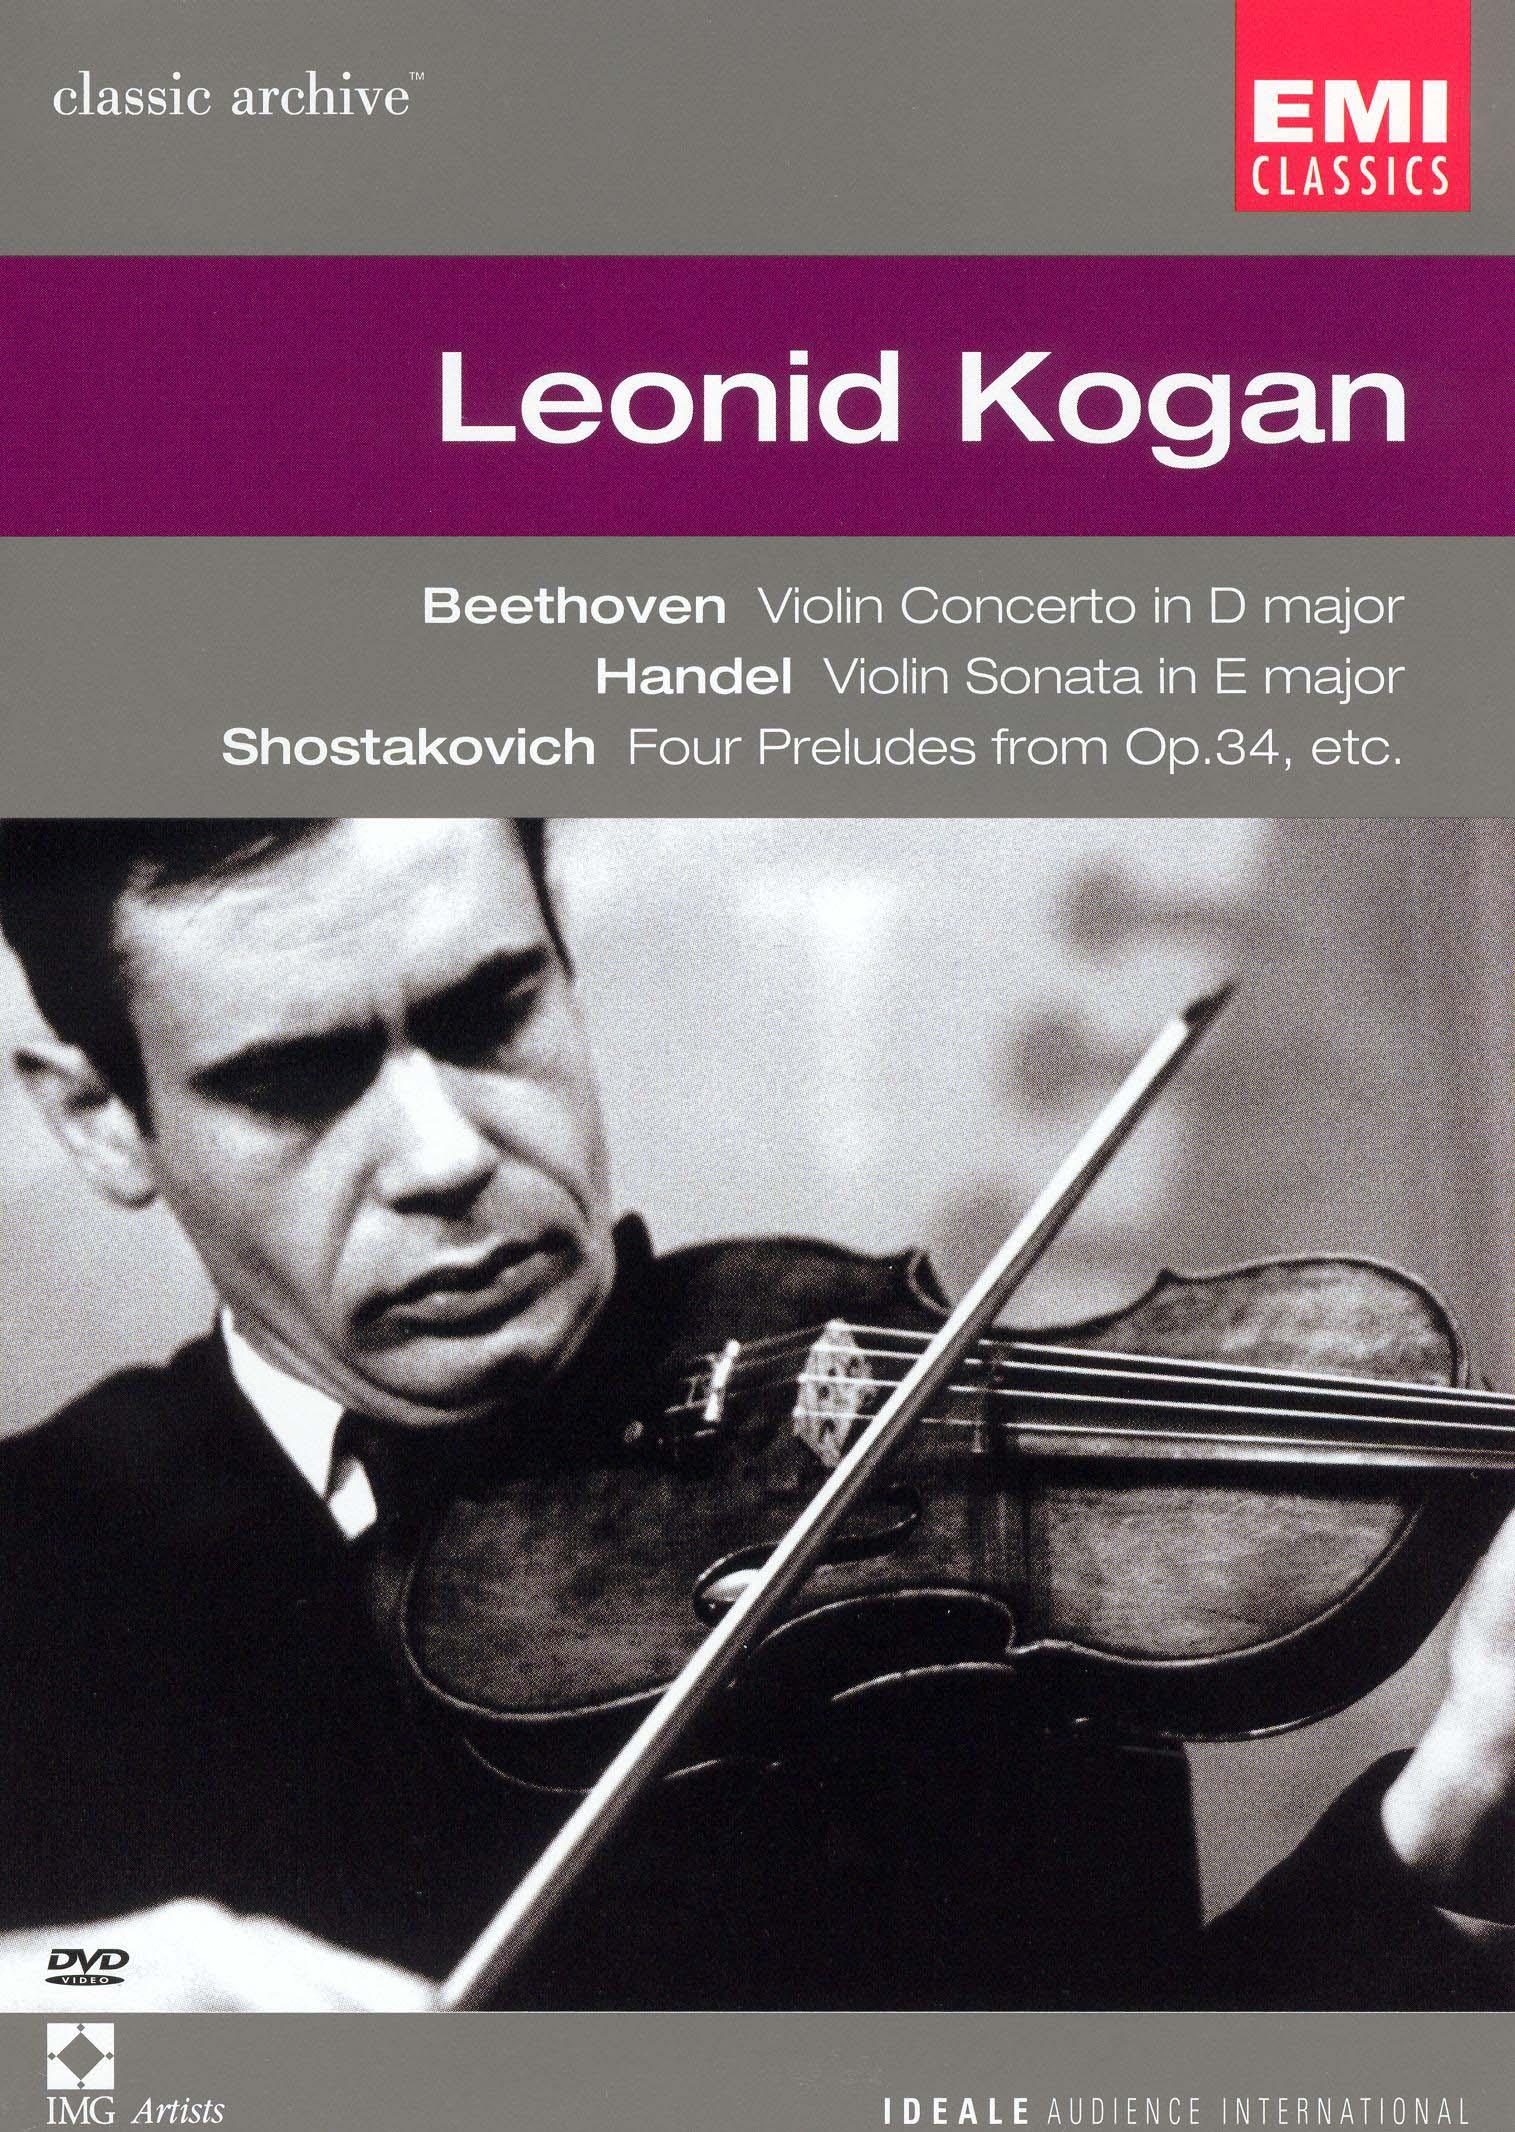 Classic Archive: Leonid Kogan - Beethoven